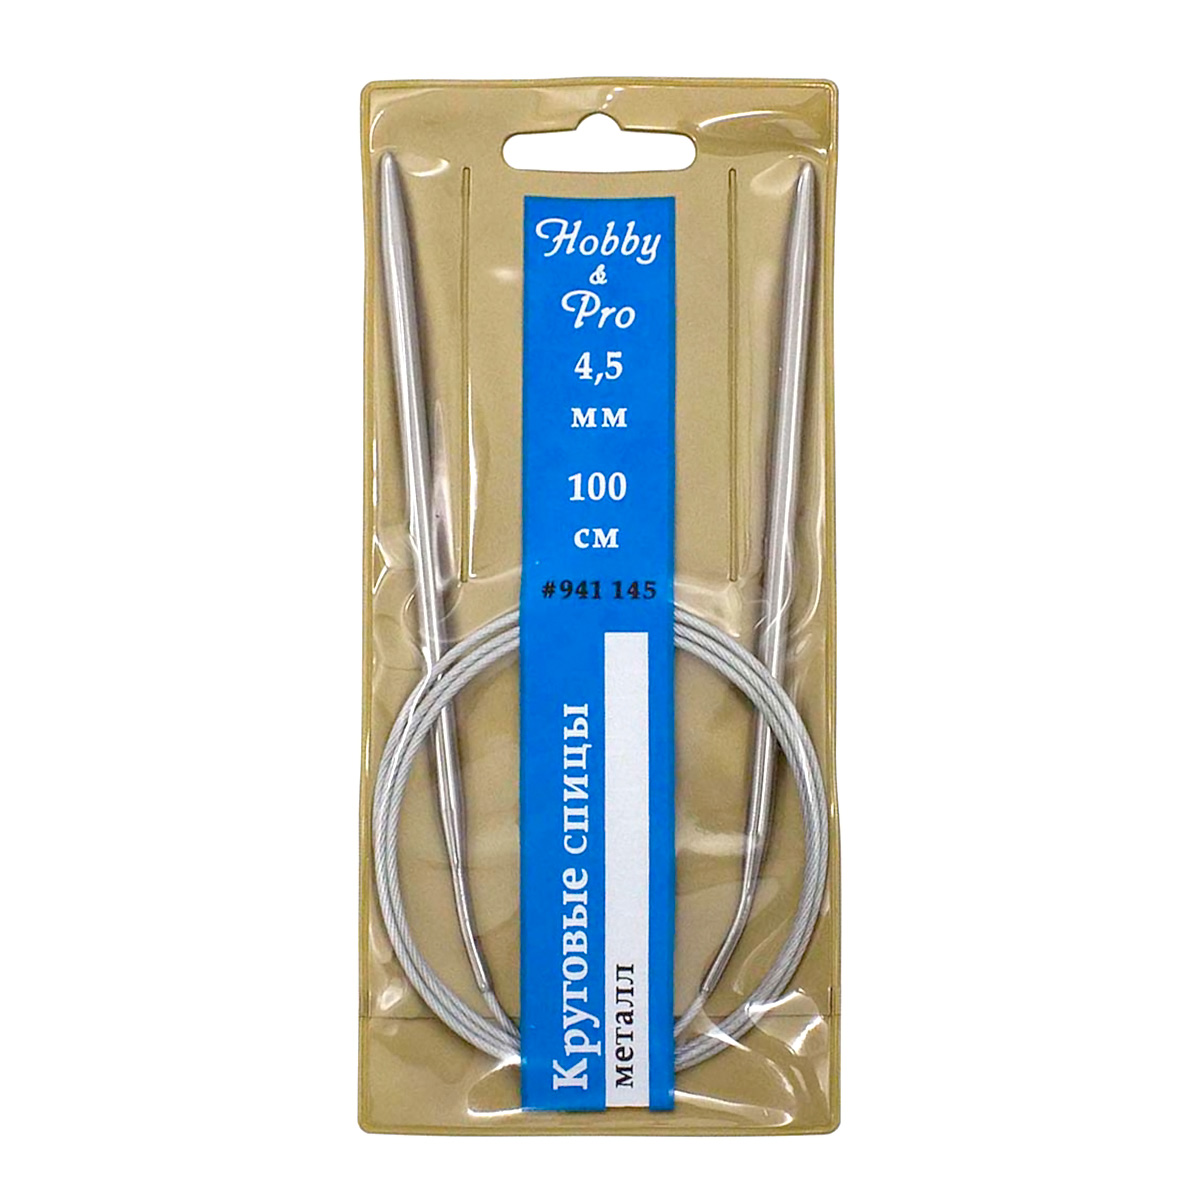 Спицы круговые металл 941145, 100 см, 4,5 мм, Hobby&Pro